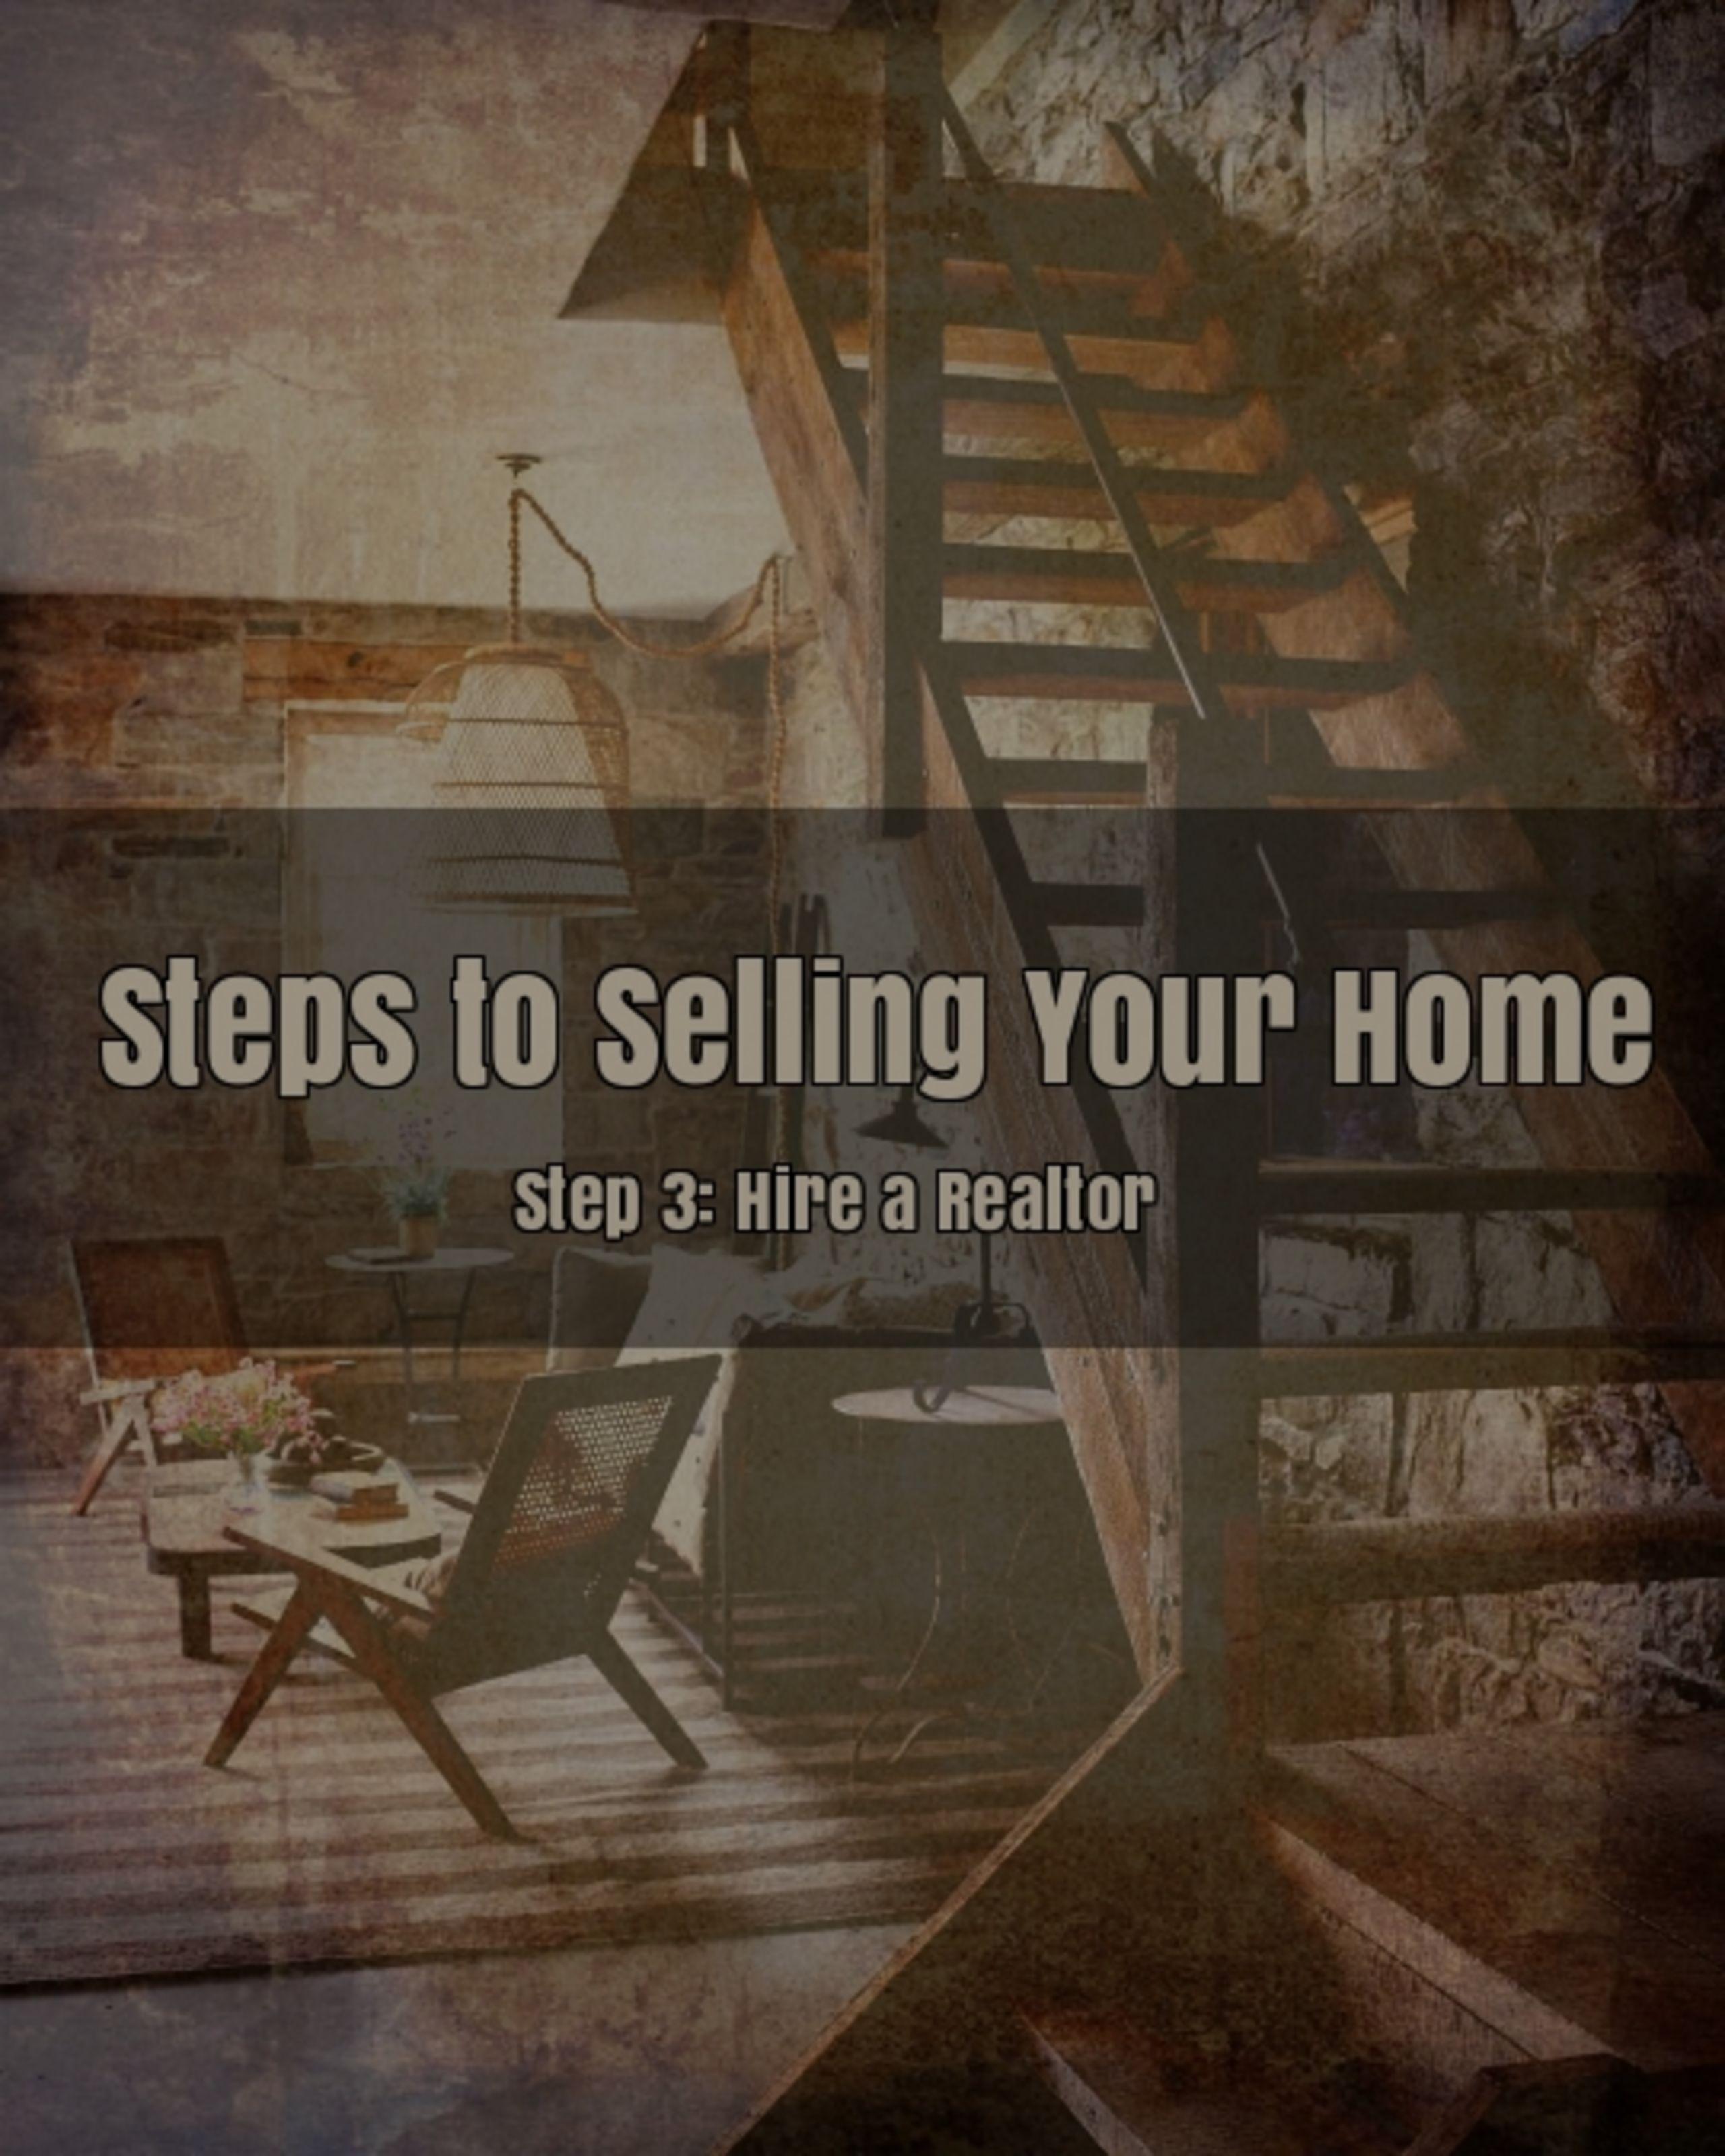 Step 3 – Hire a Realtor